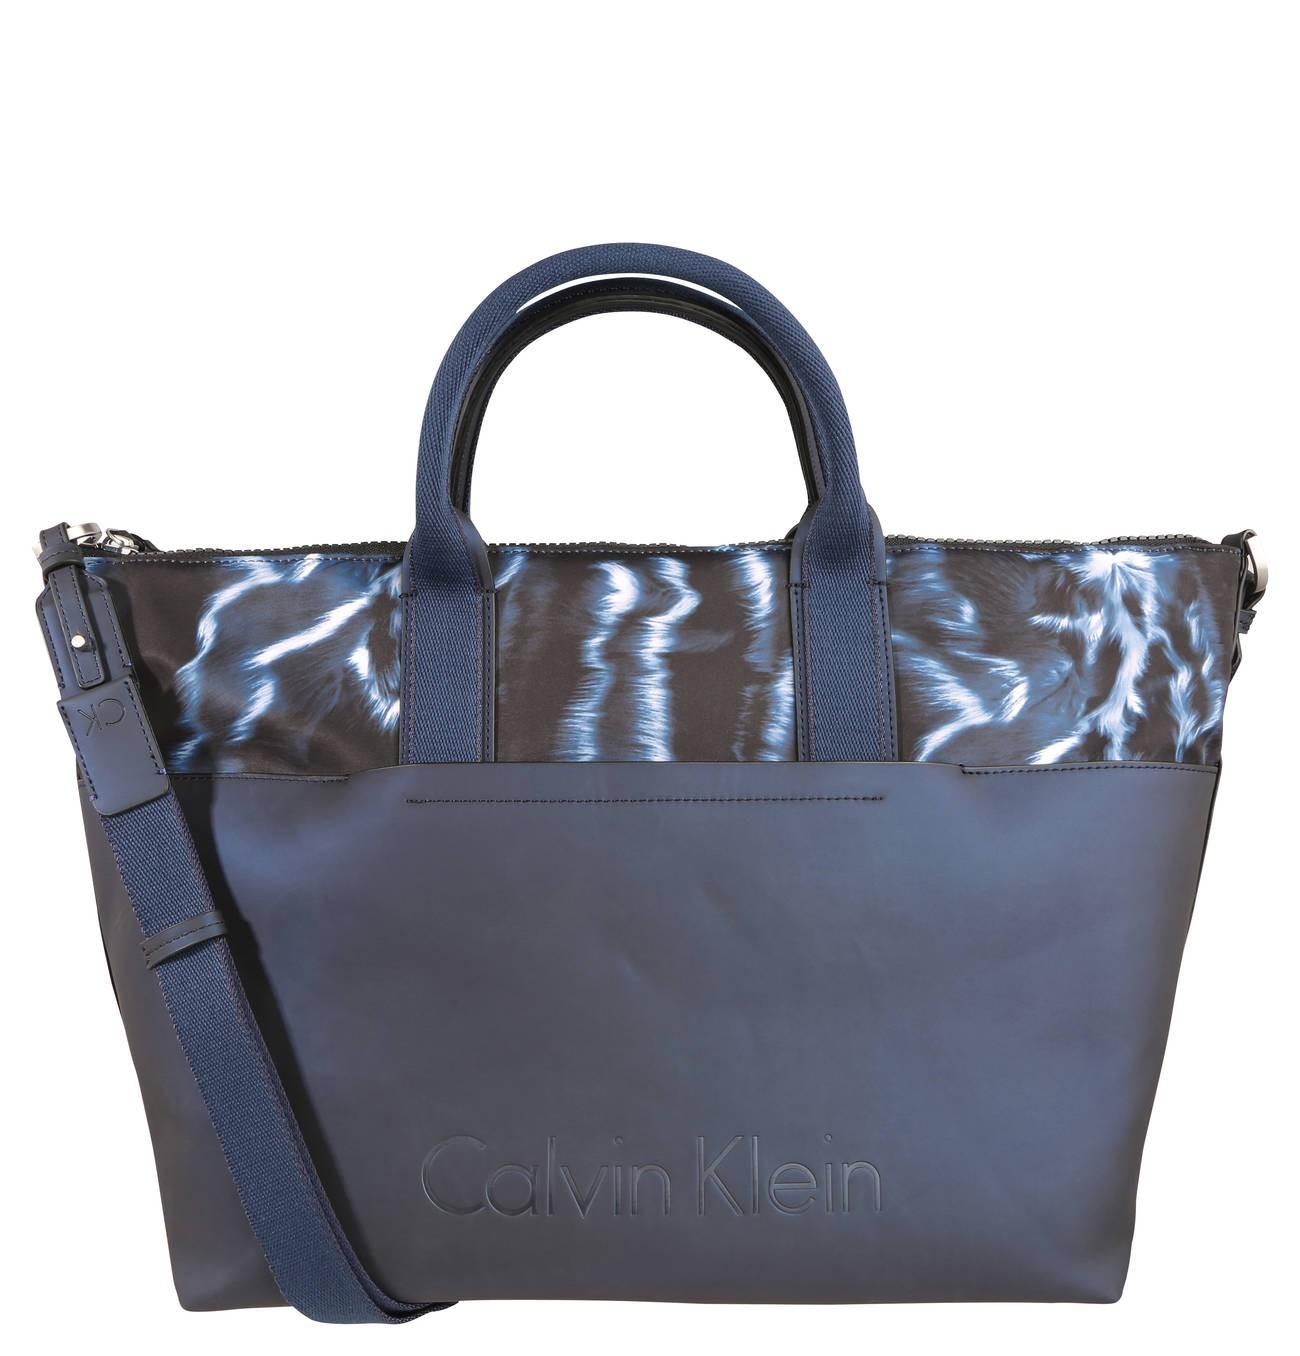 4025070c62473d Borse donna Calvin Klein in saldi vendita online - Silvana Accessori ...